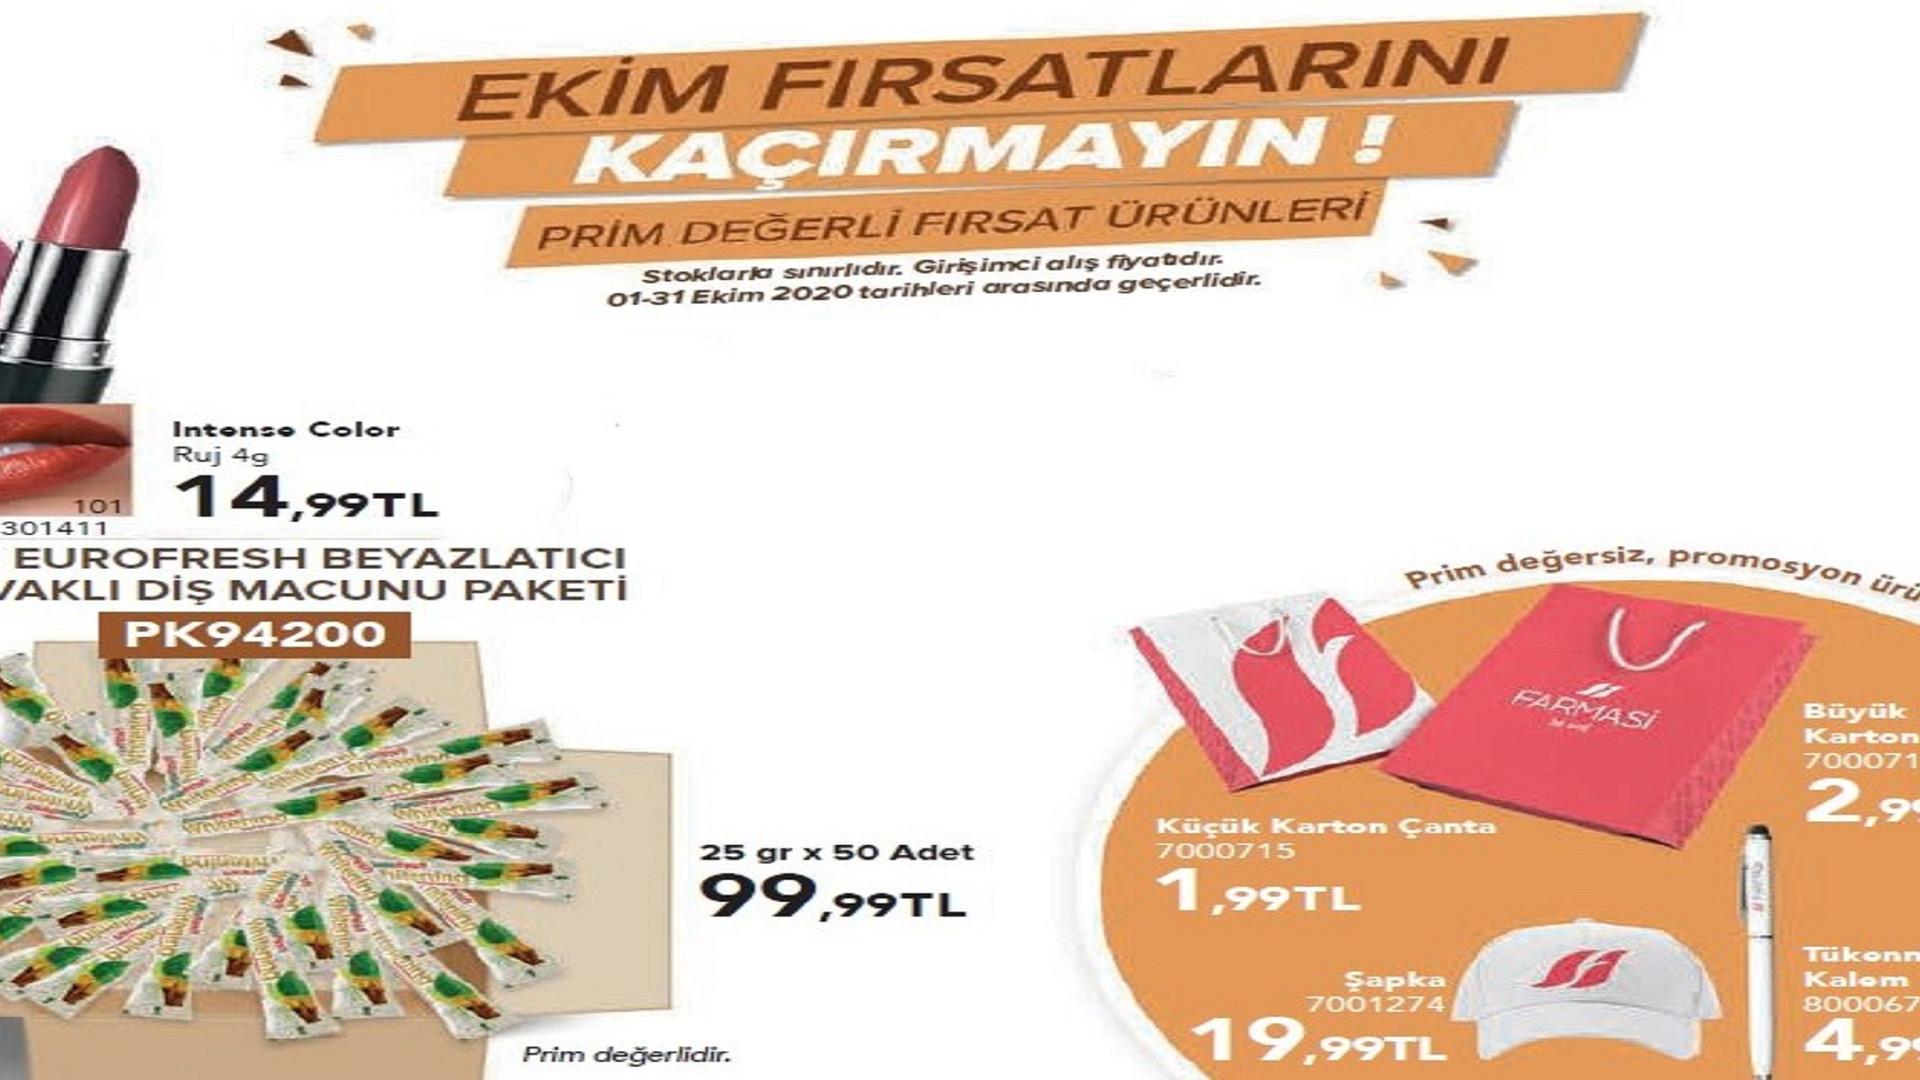 farmasi-ekim-sans-katalogu-2020 (17).jpg